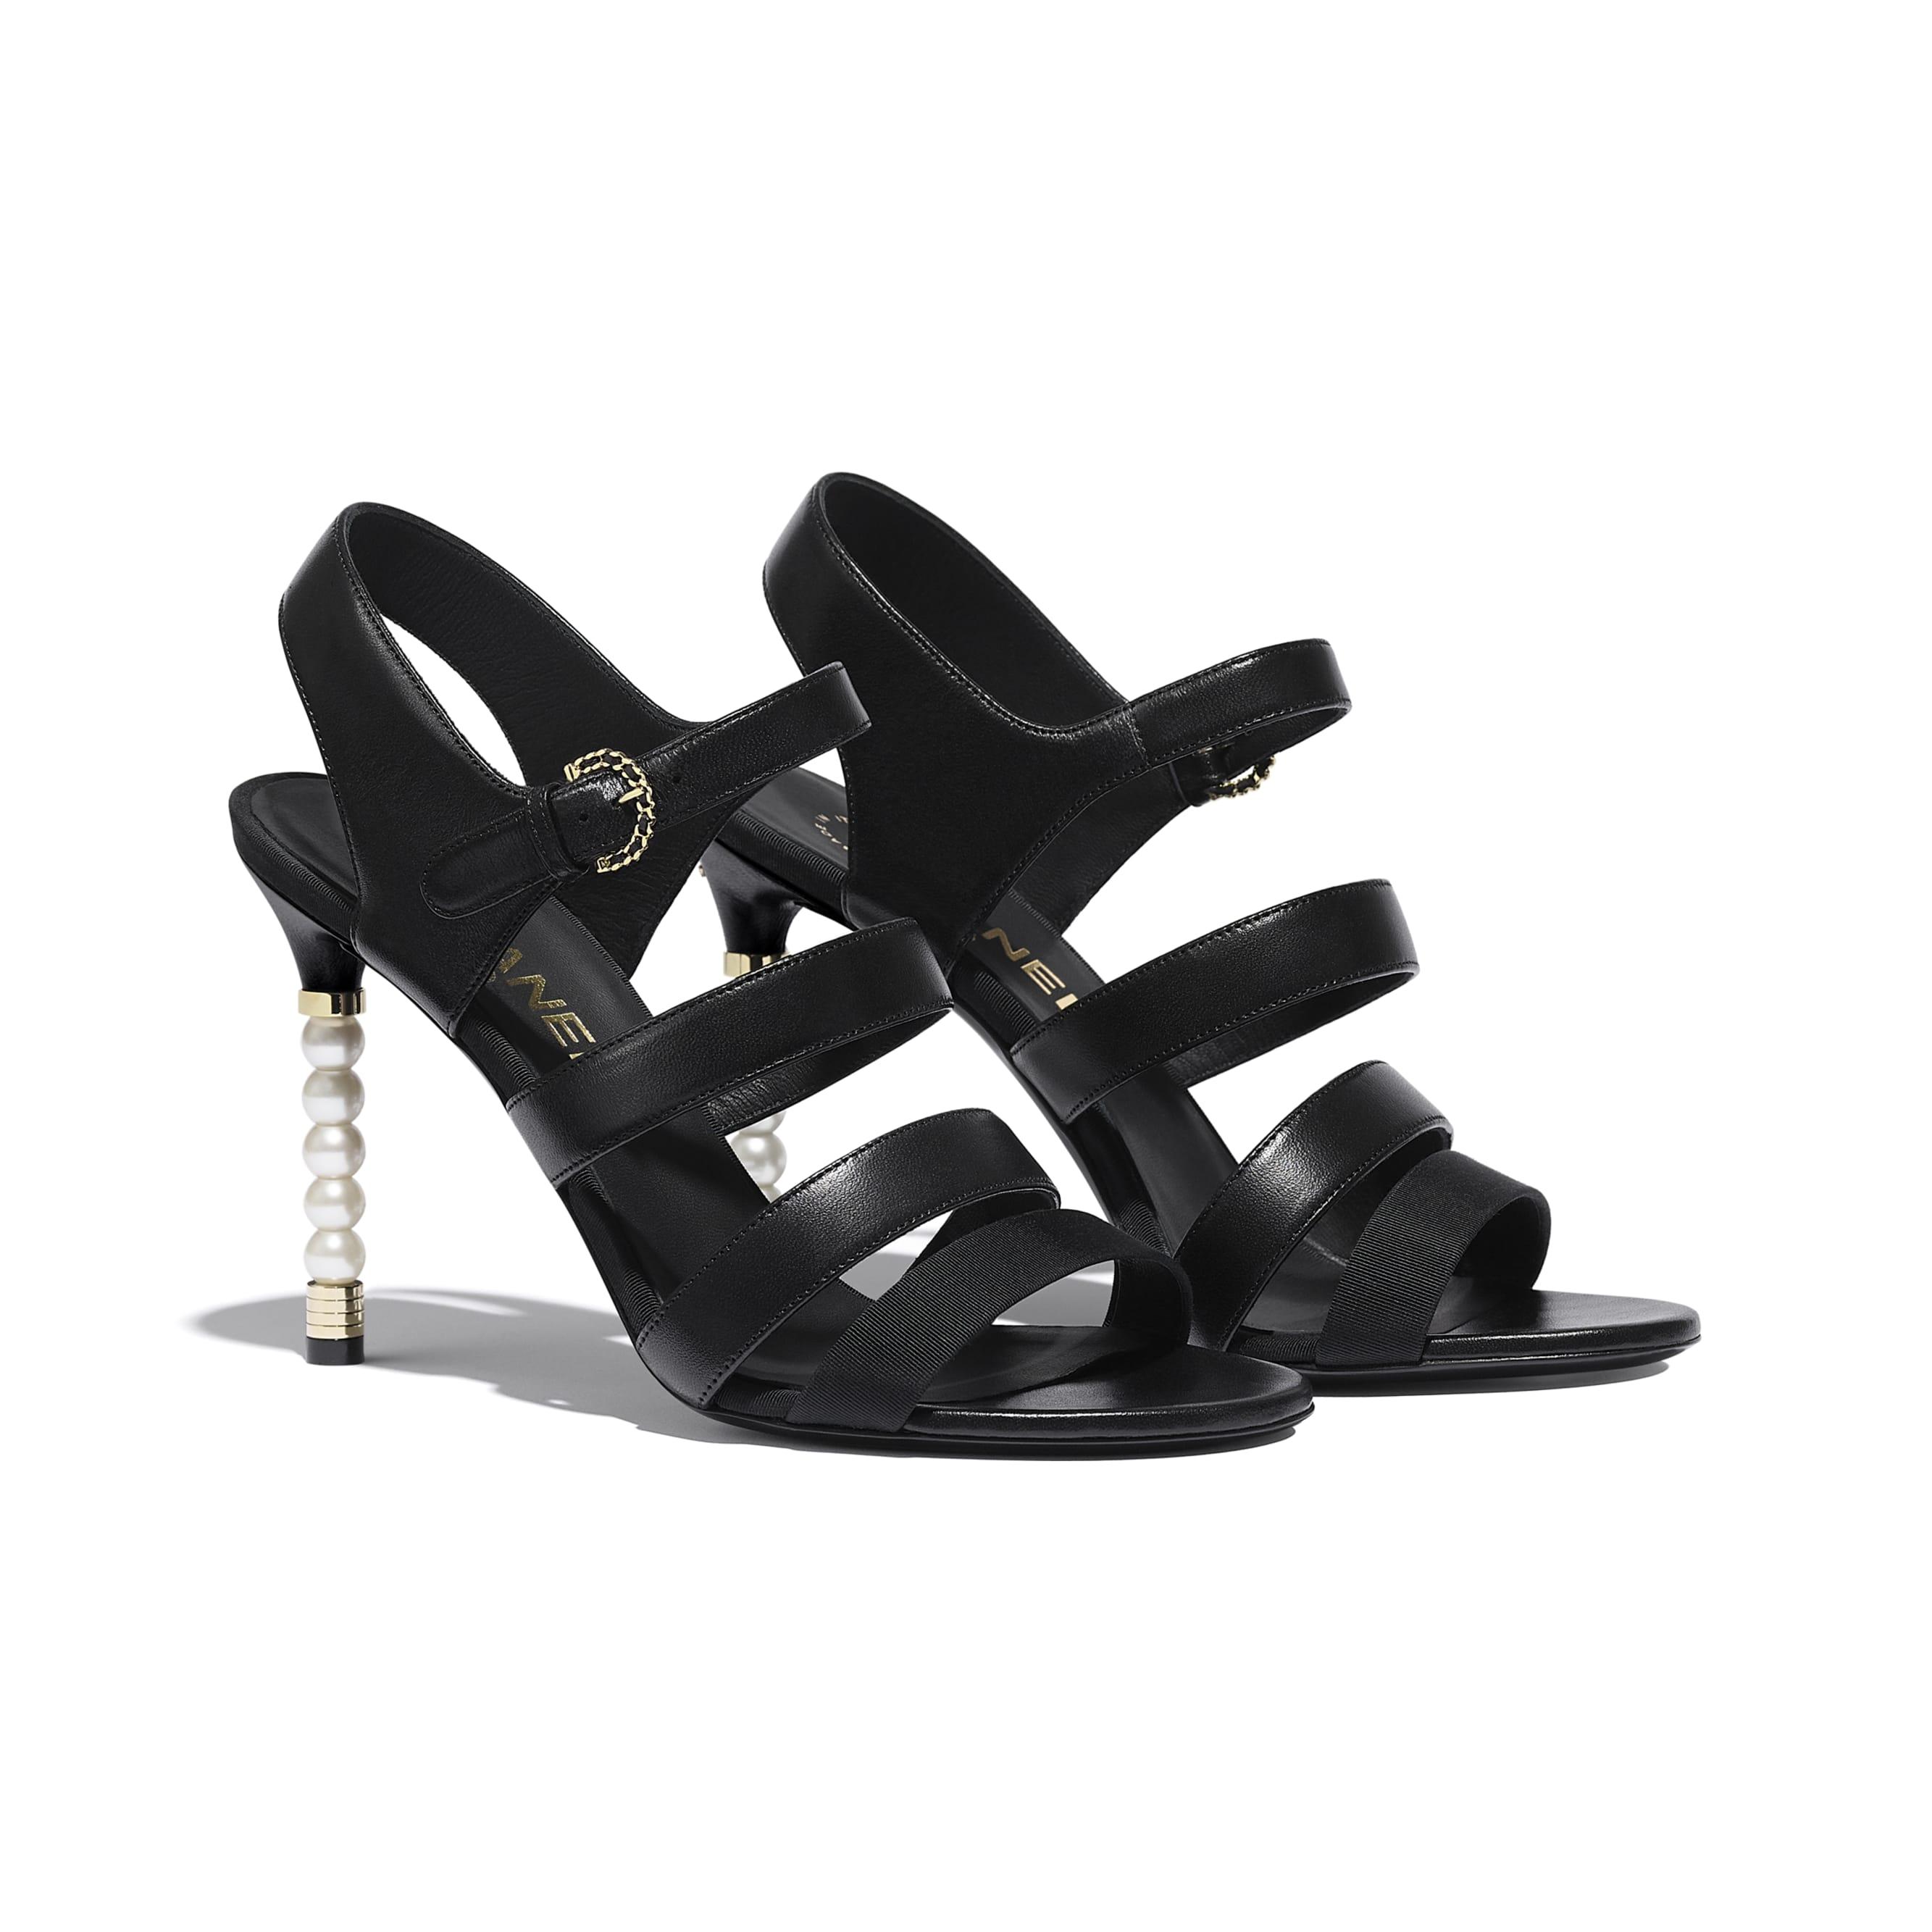 Sandals - Black - Lambskin & Grosgrain - CHANEL - Alternative view - see standard sized version